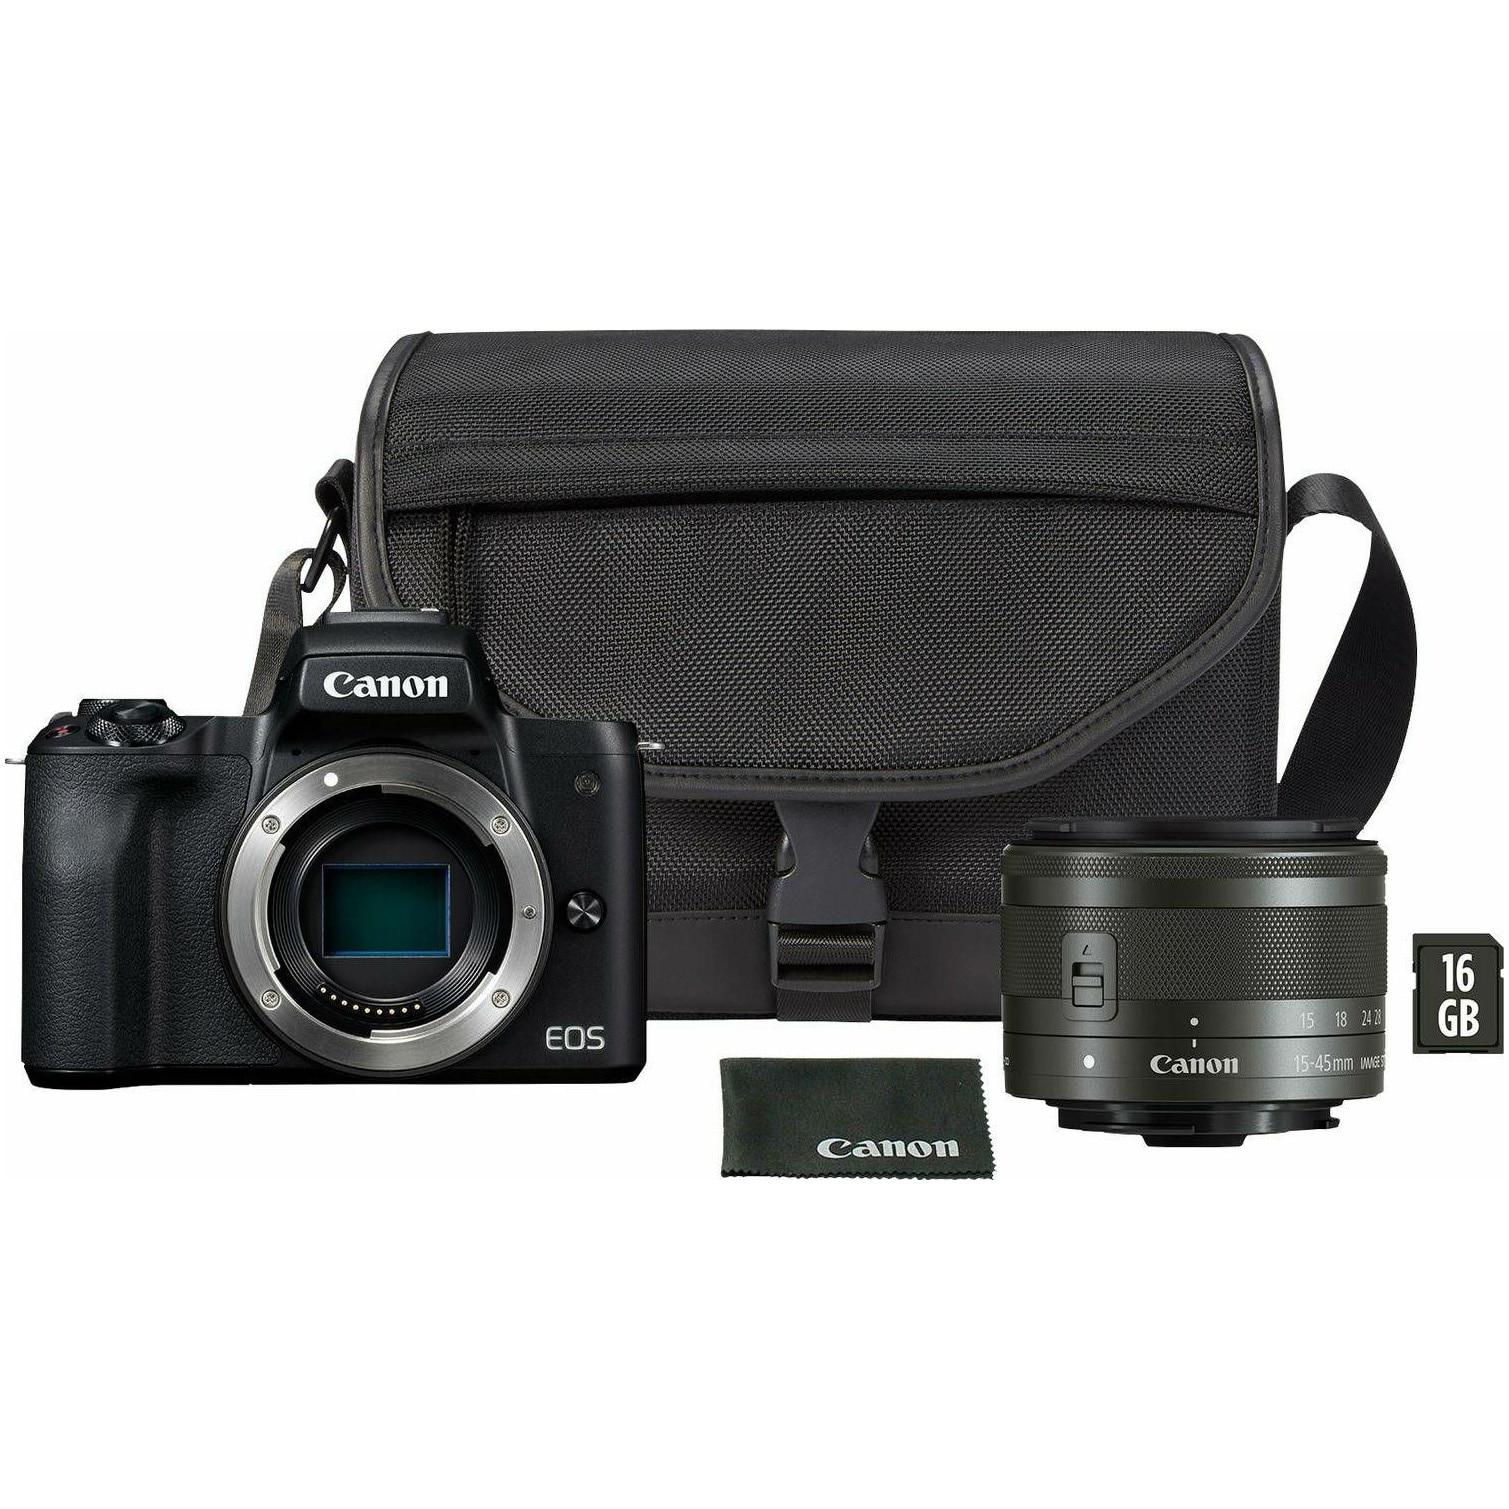 Fotografie Aparat foto mirrorless Canon EOS-M50 Mark II, 24.1 MP, 4K, Wi-Fi, Negru, + Obiectiv 15-45mm + Geanta + Card memorie 16GB